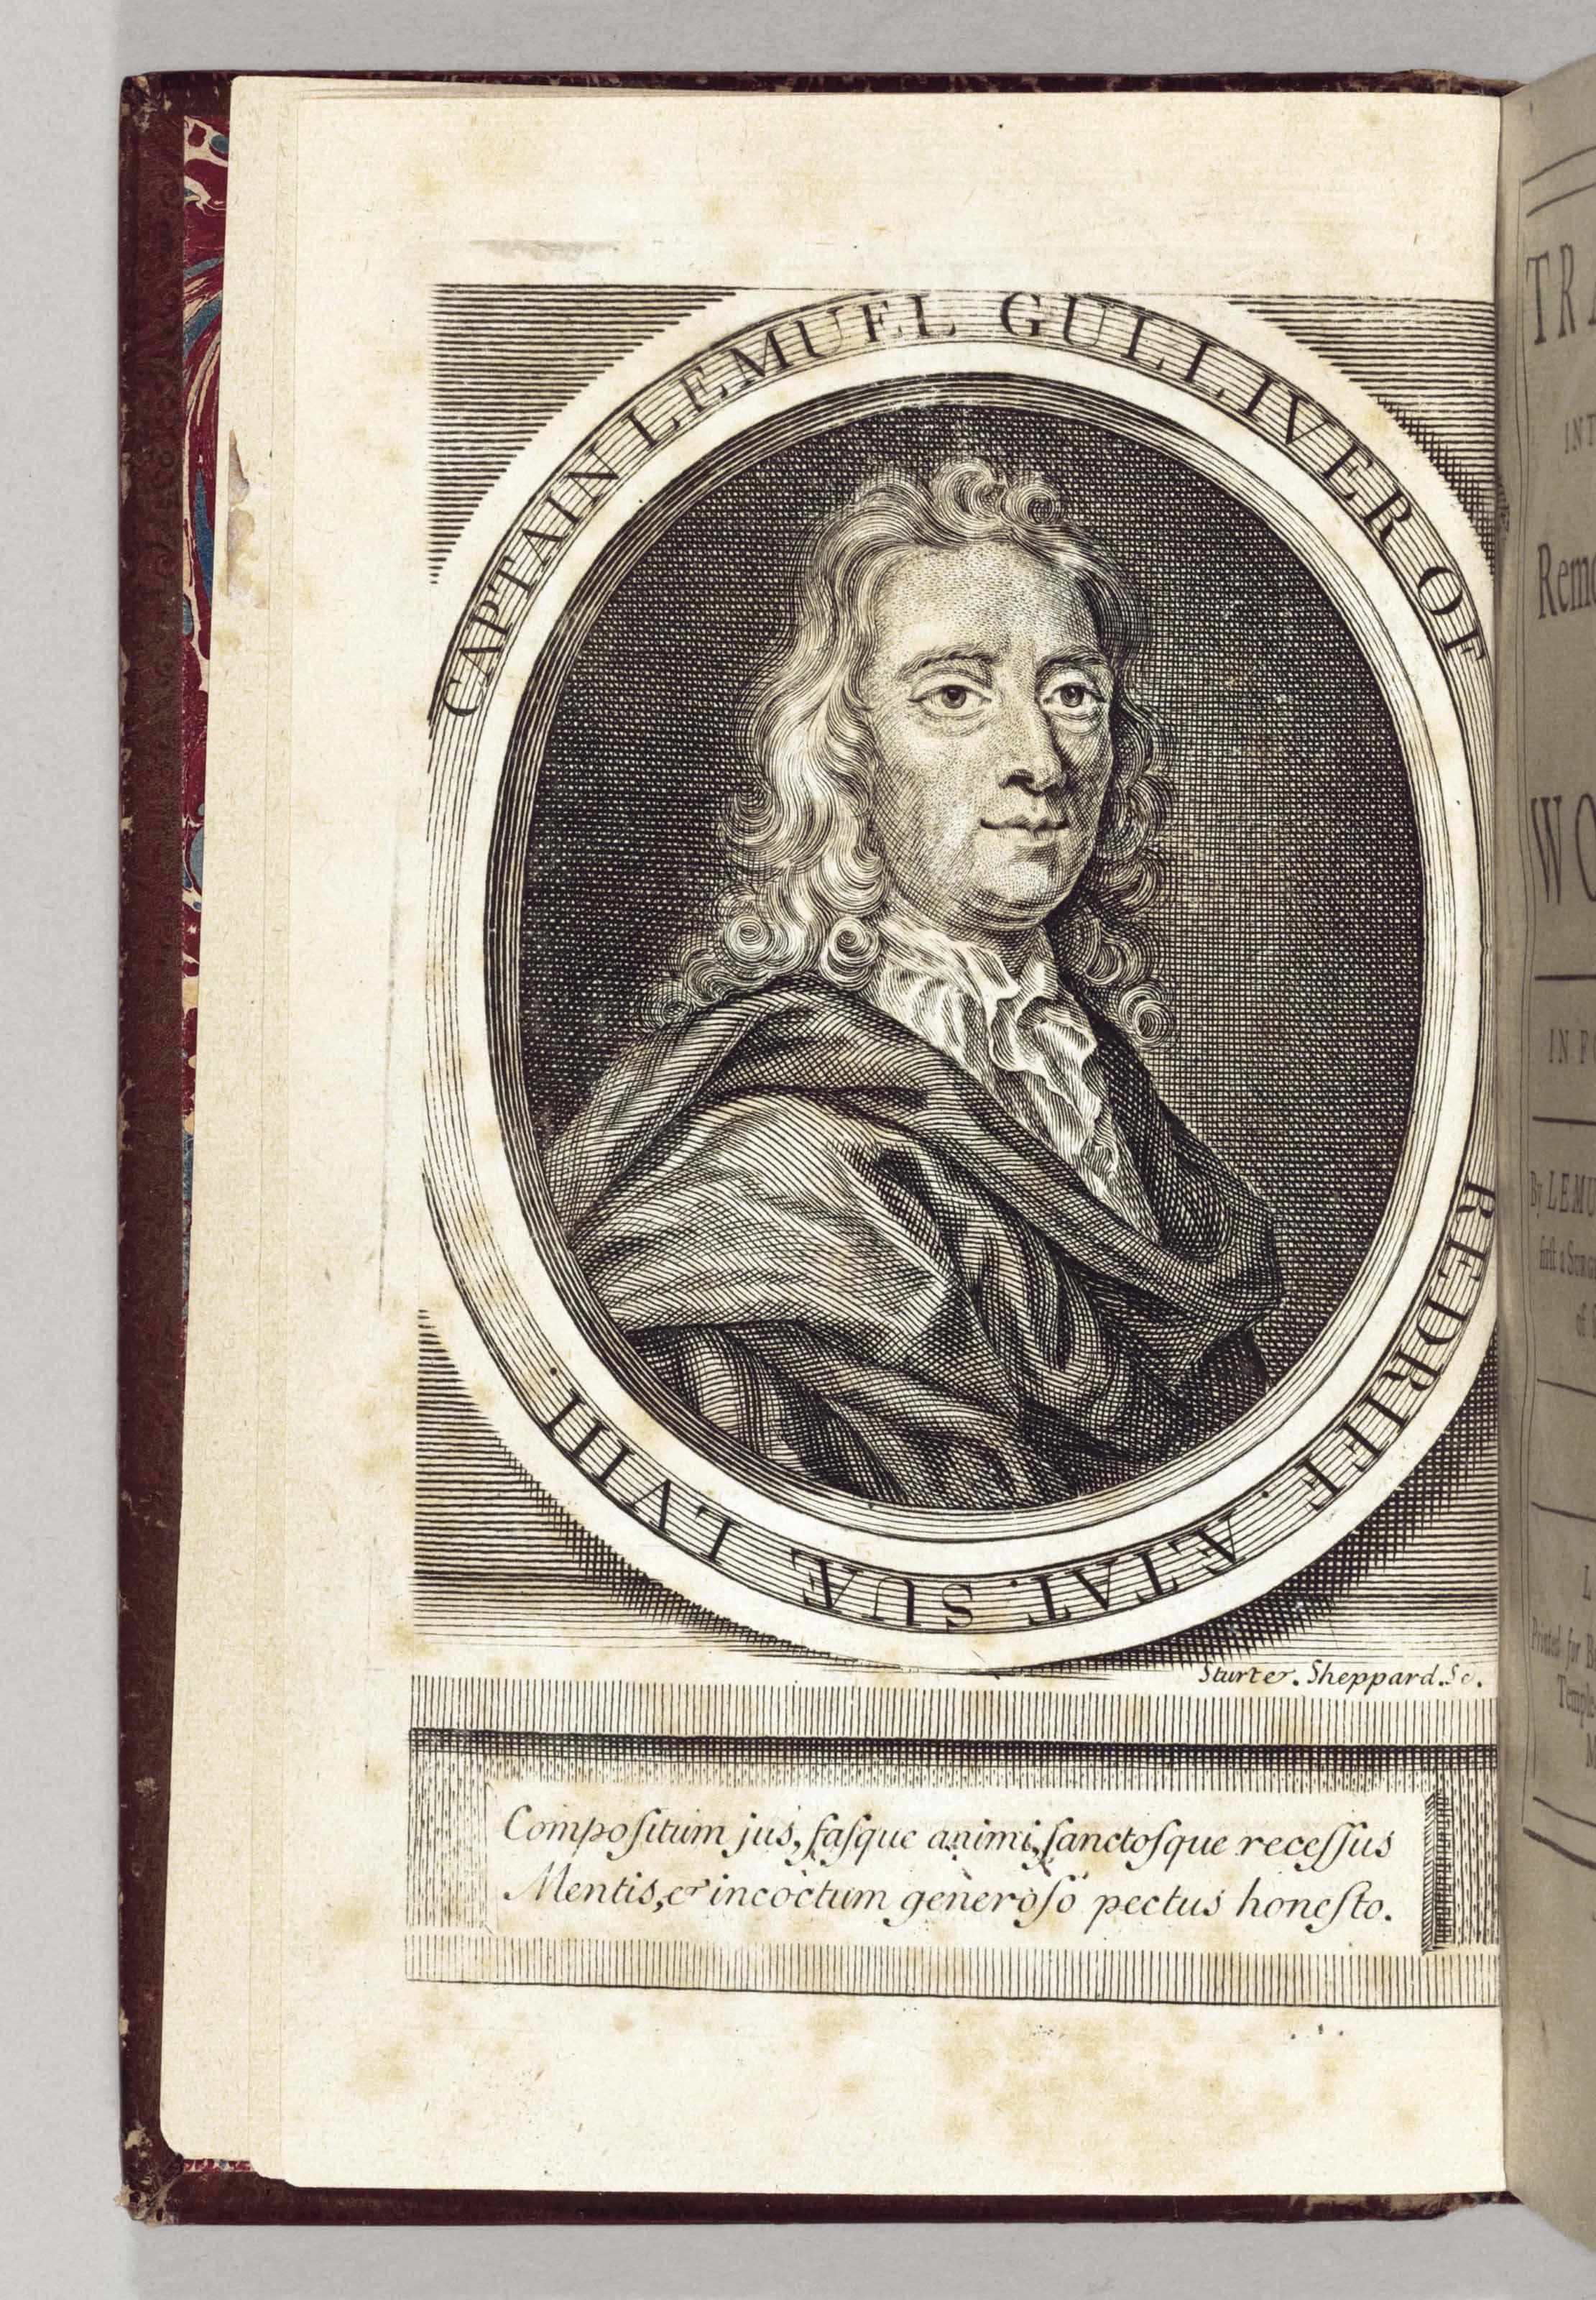 SWIFT, Jonathan (1667-1745). T